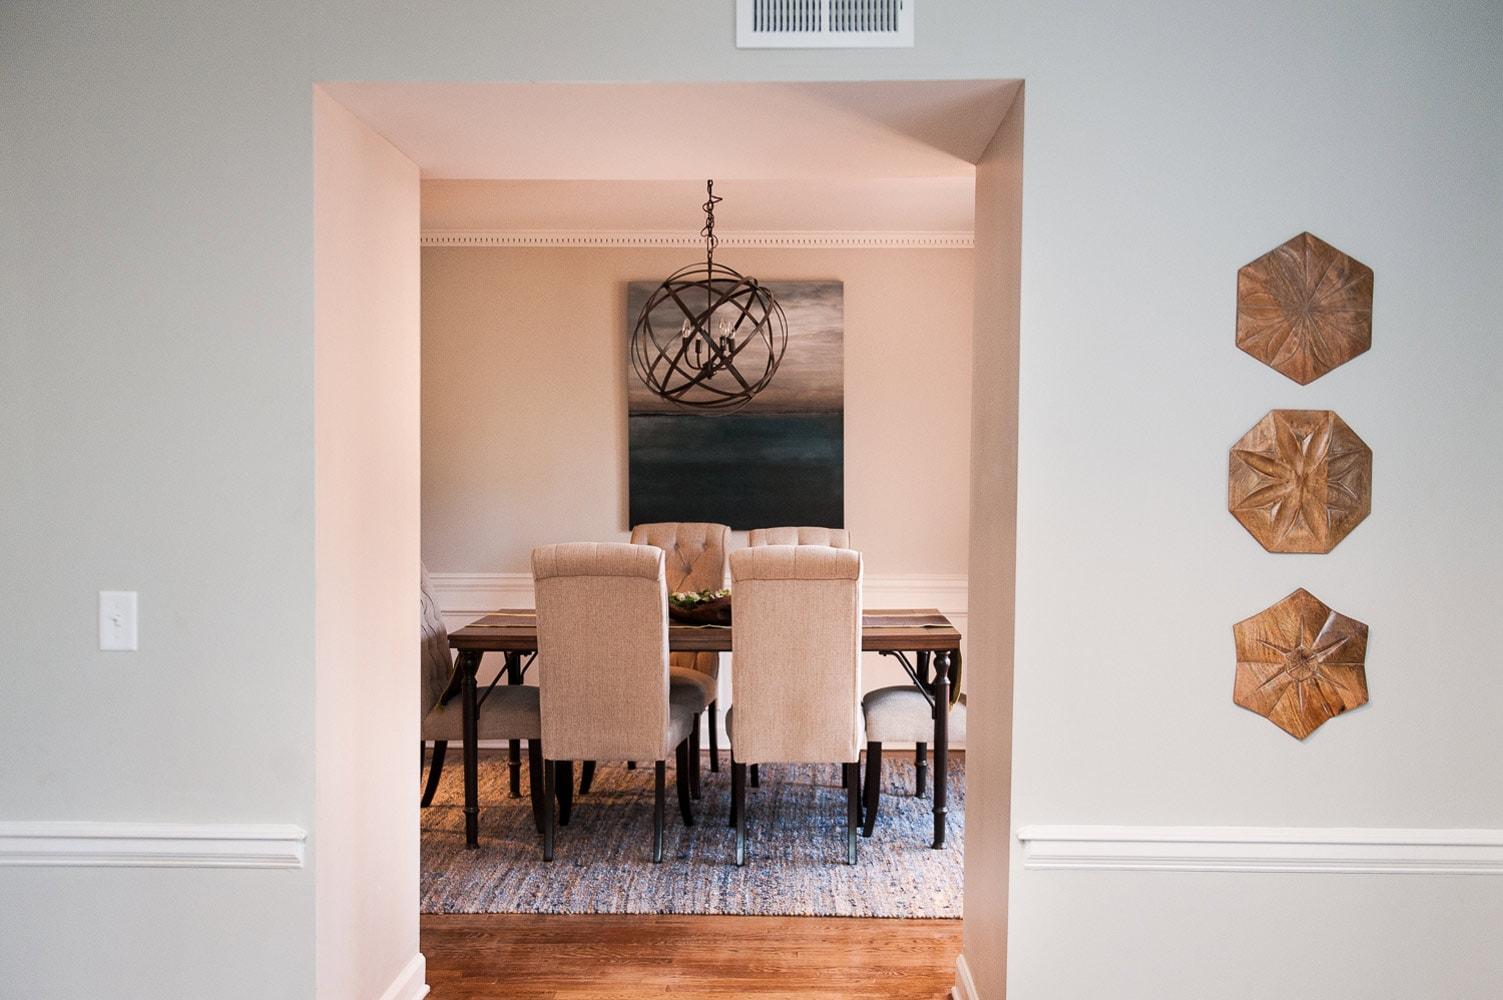 Wieuca Road dining room interior design in Atlanta